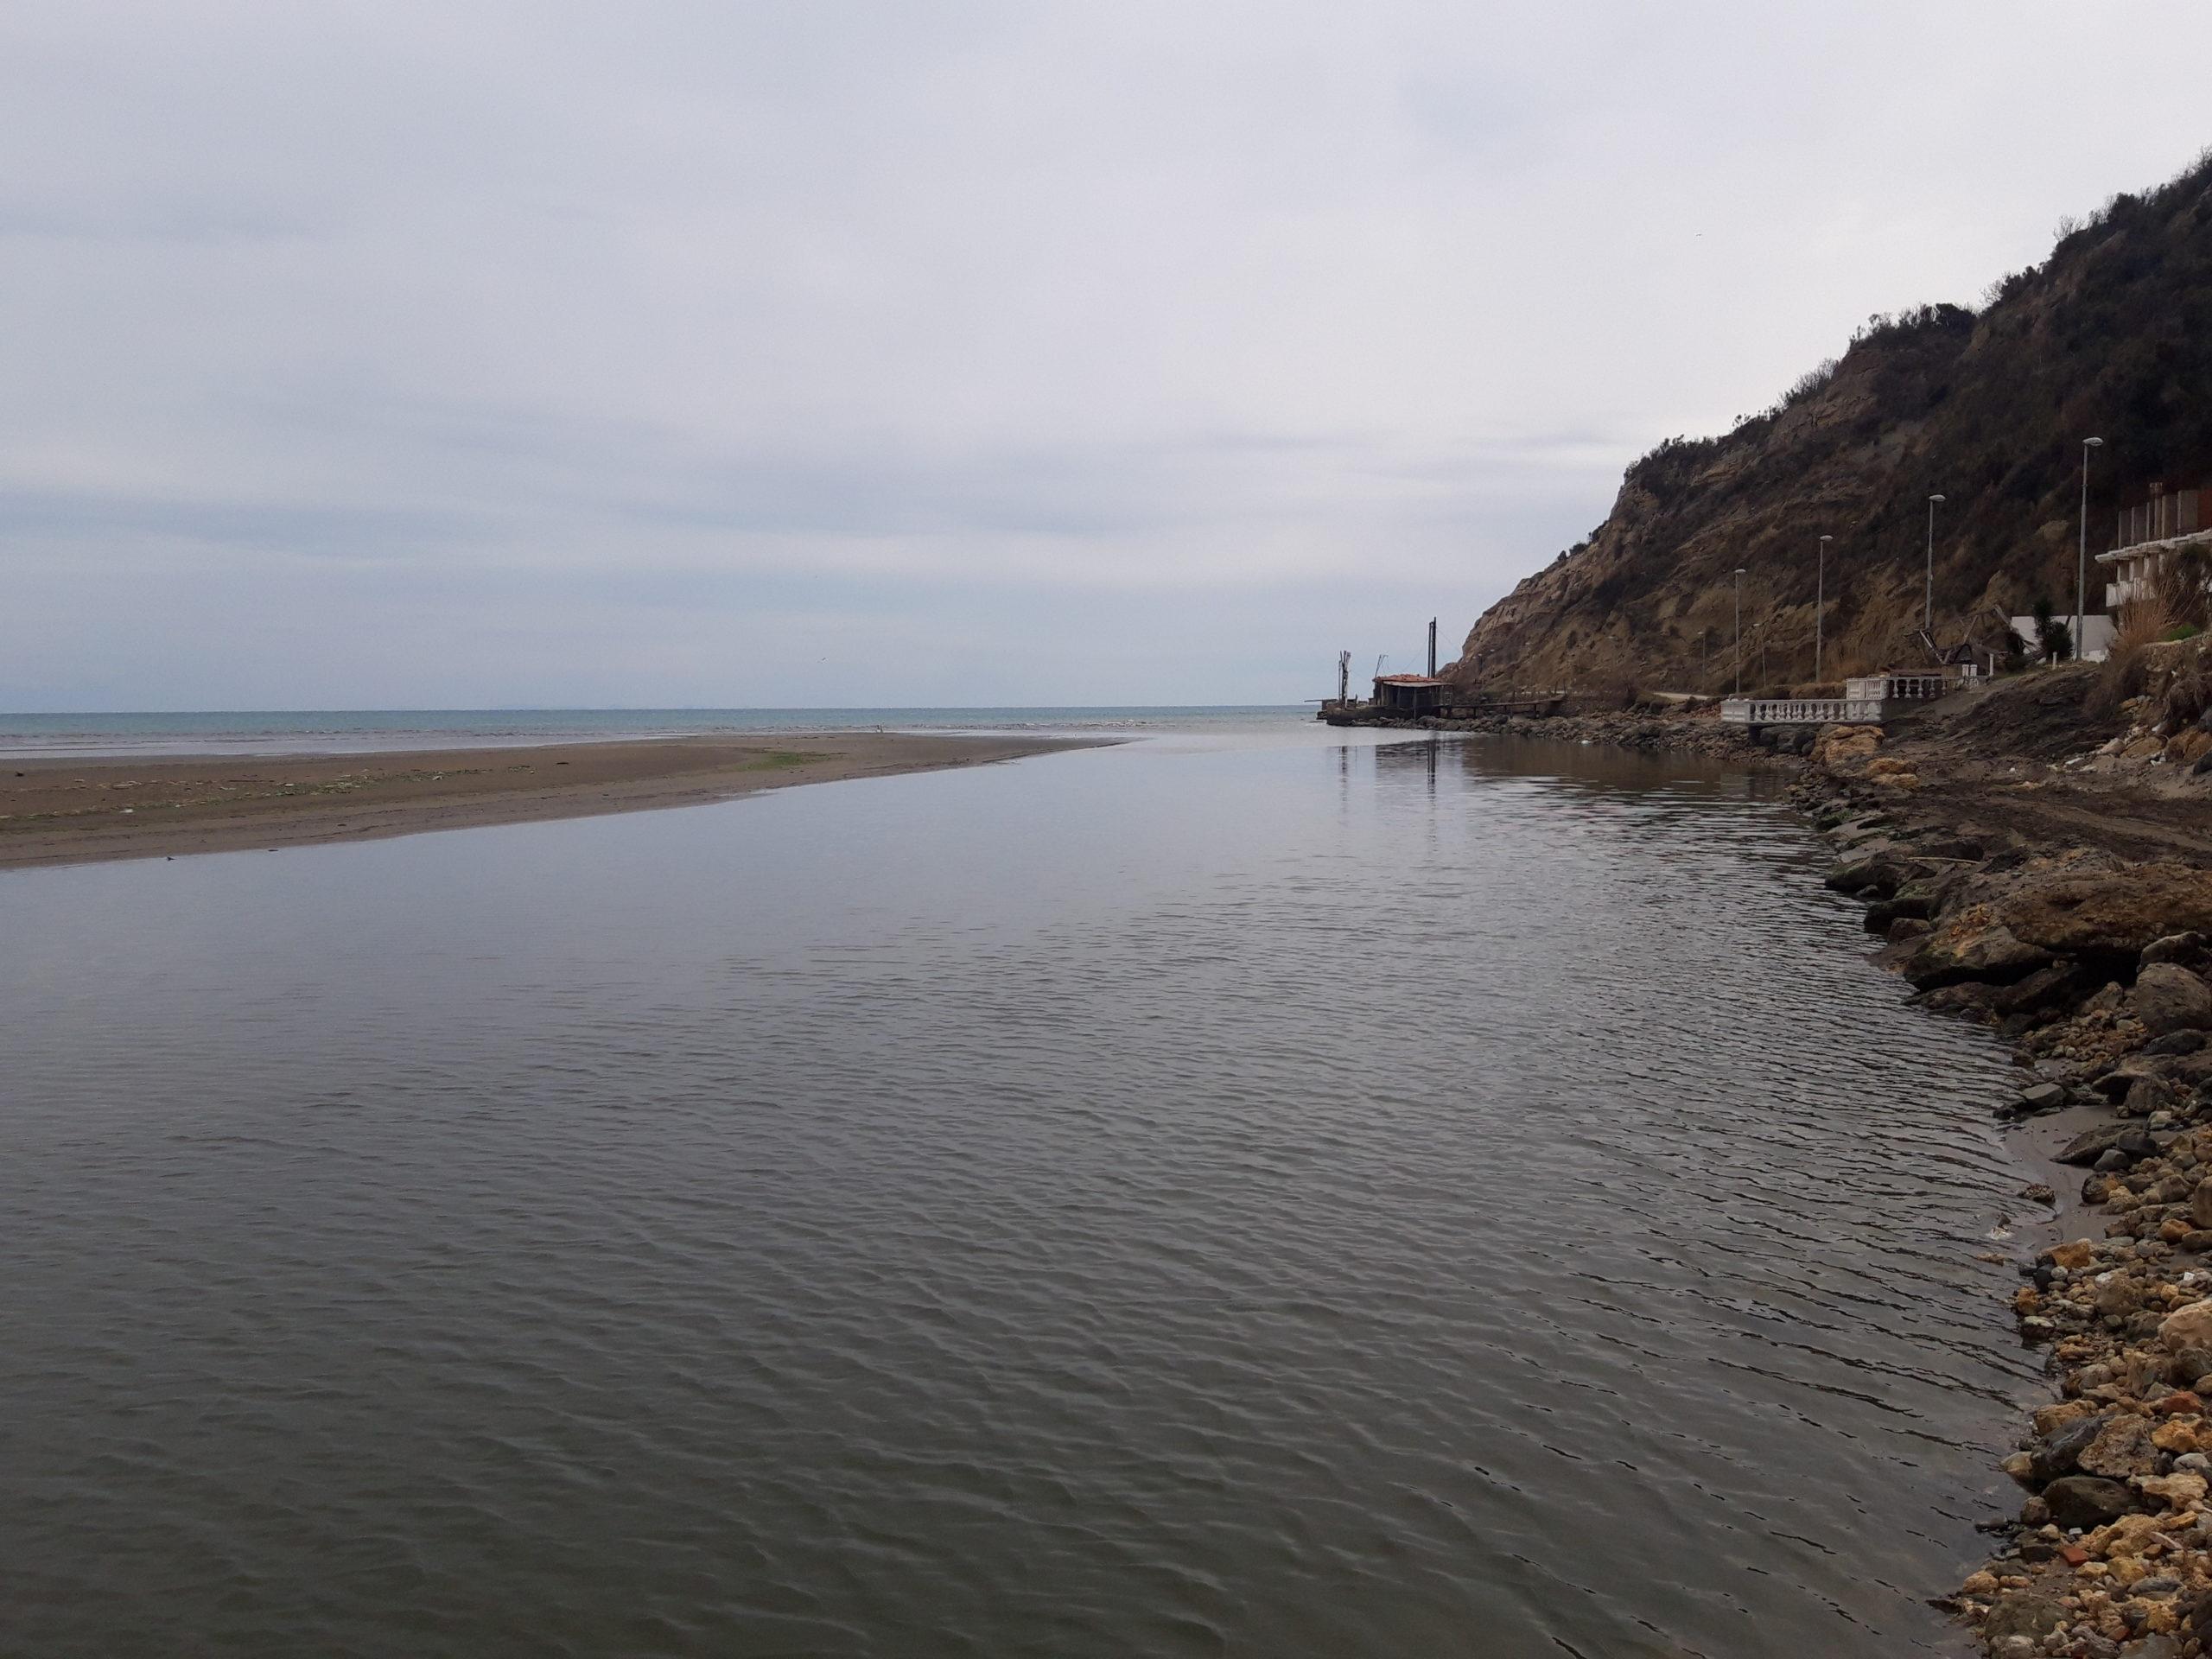 NADE ULCINJSKIH RIBARA I VLASNIKA PLOVILA: Čeka se luka spasa